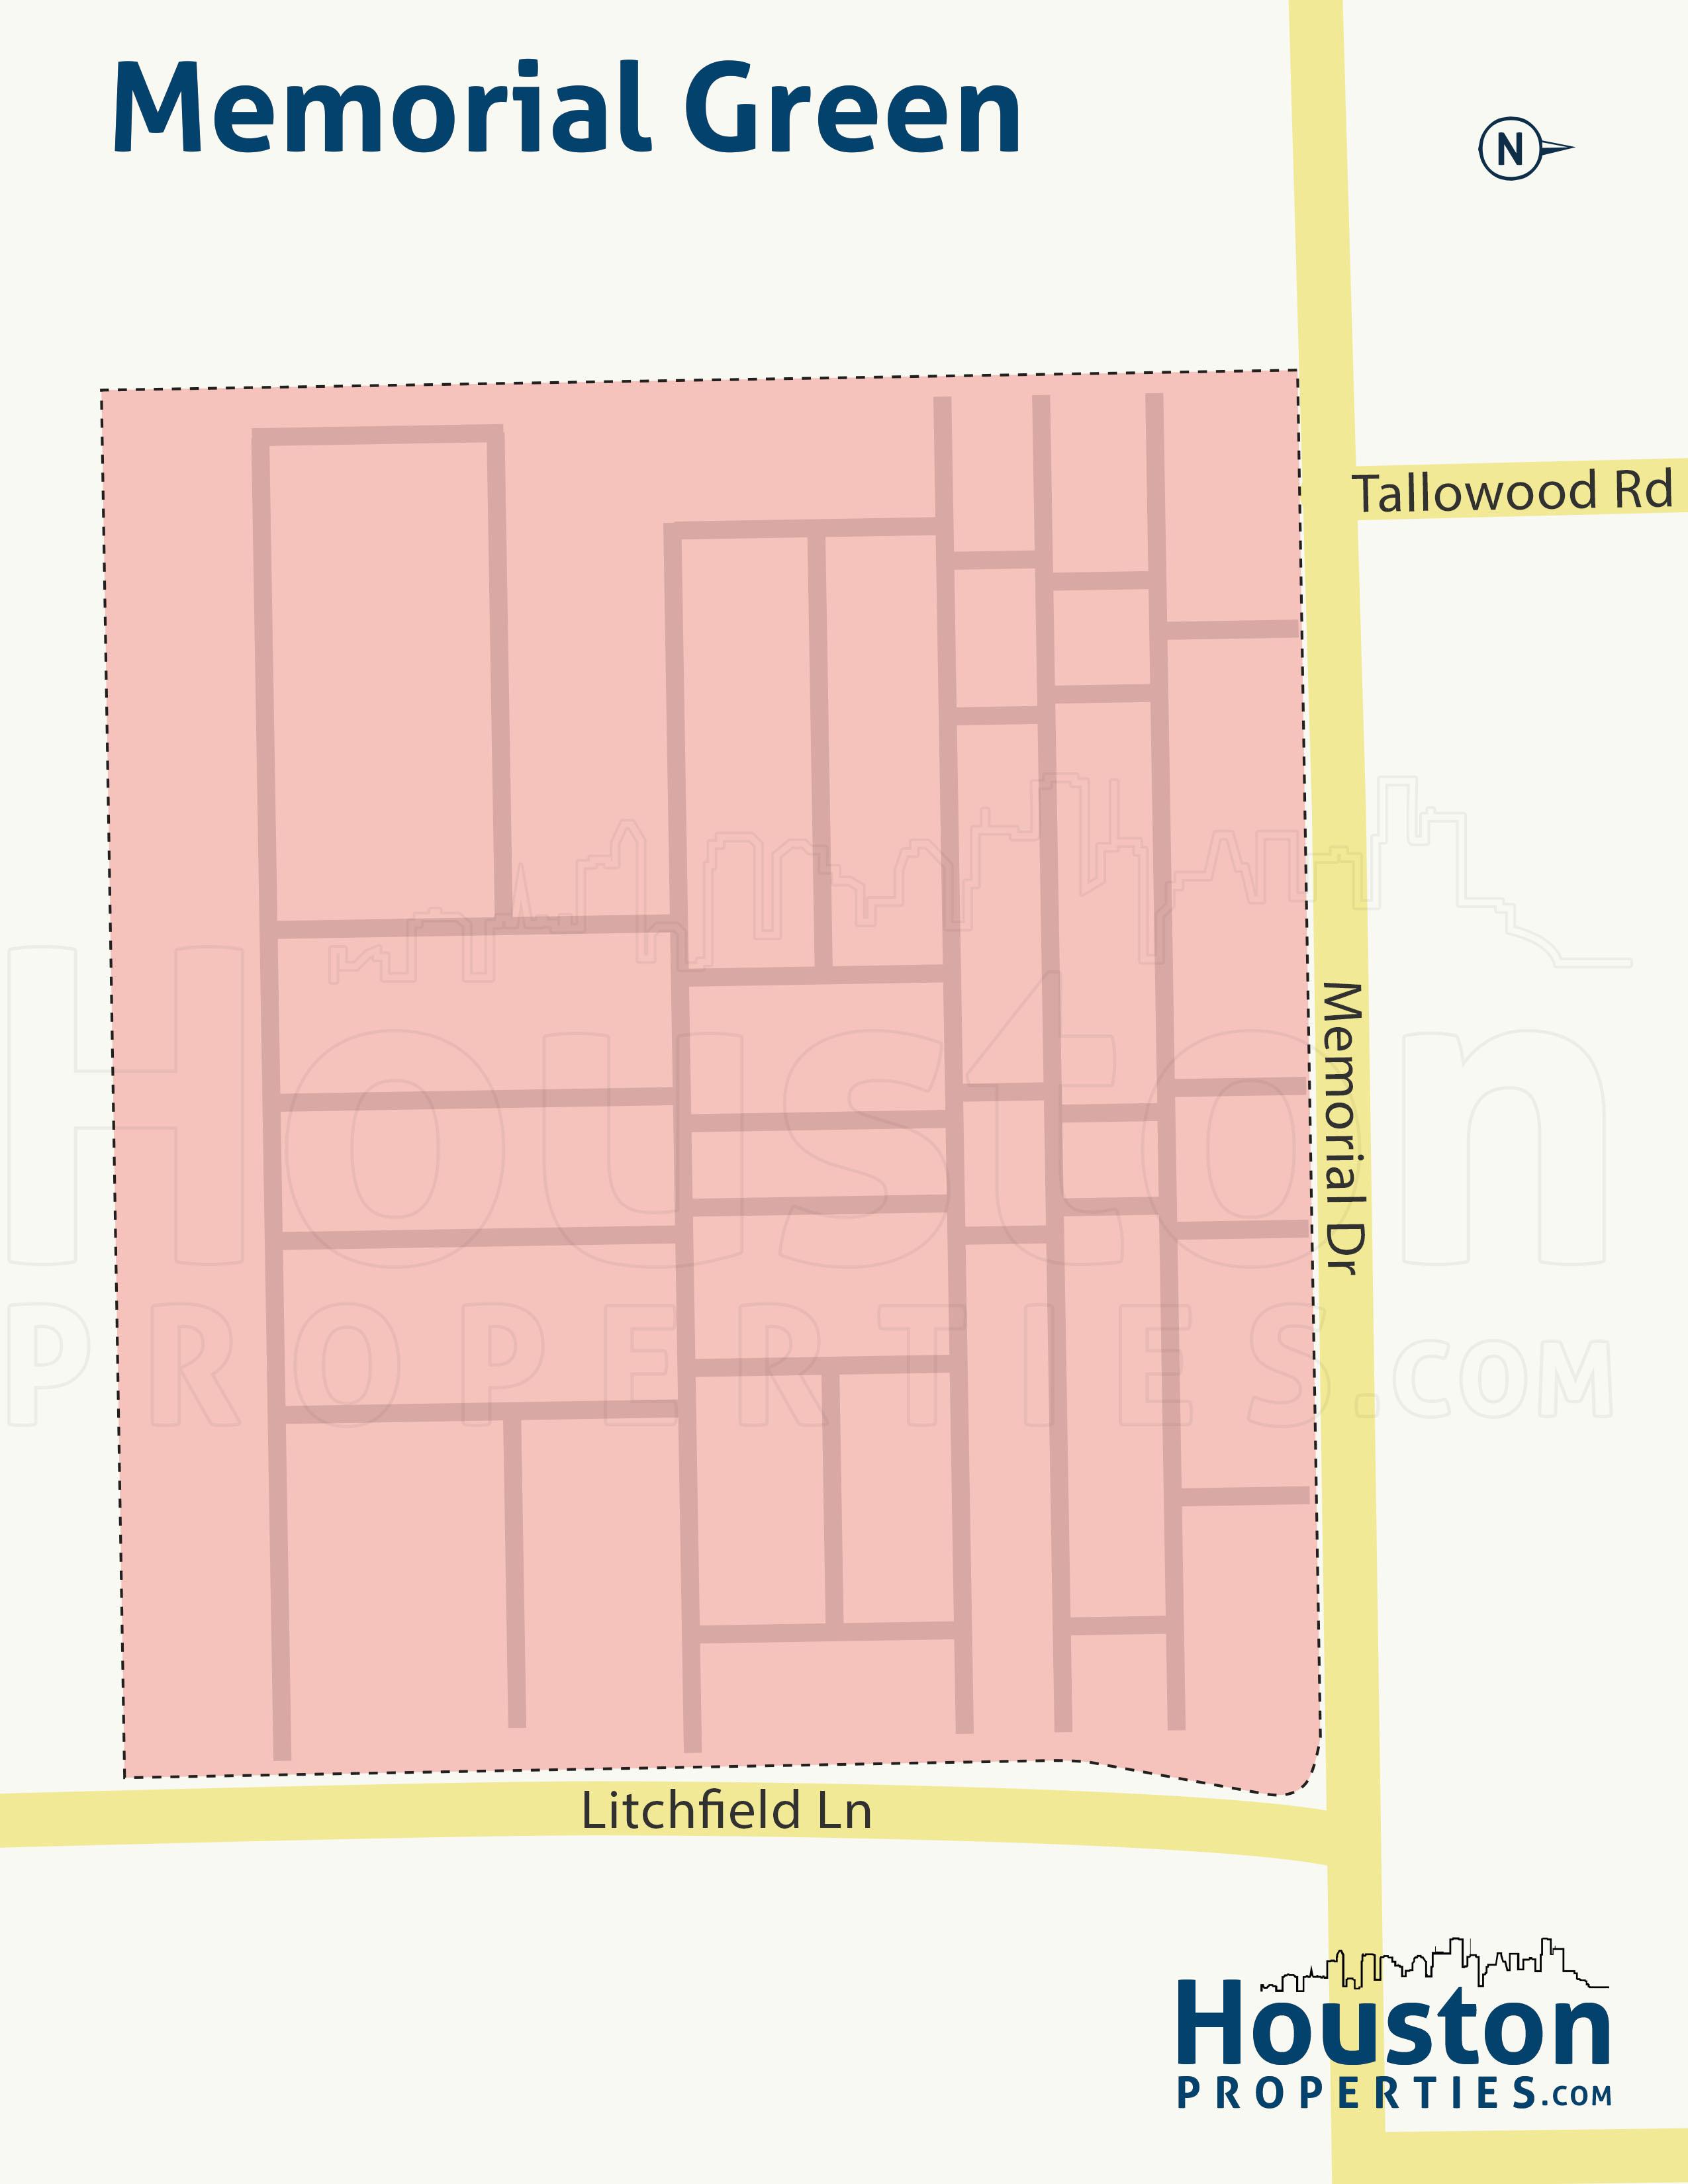 Memorial Green Houston Neighborhood Map